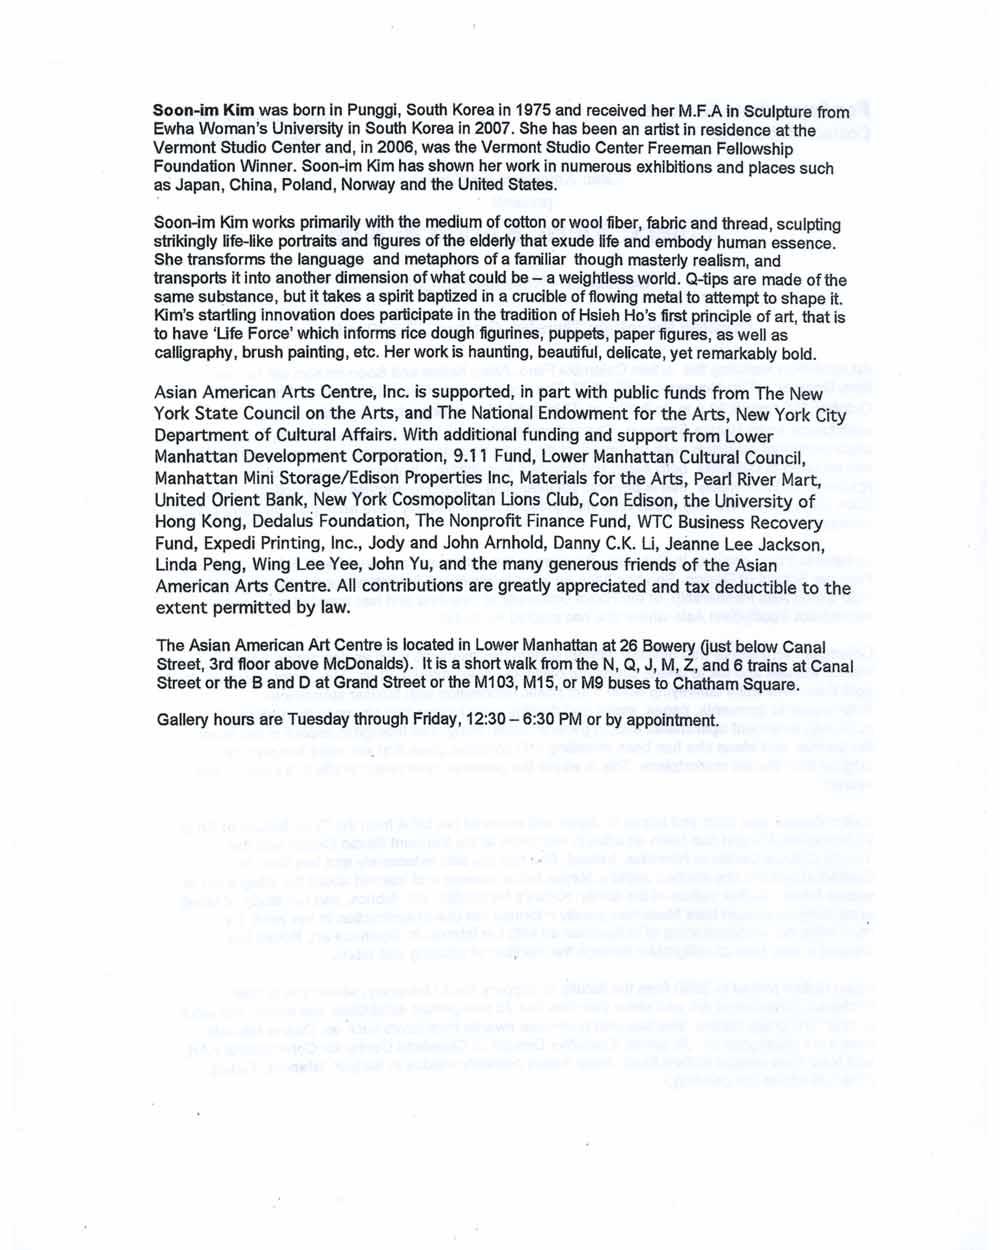 Fibers, press release, pg 2